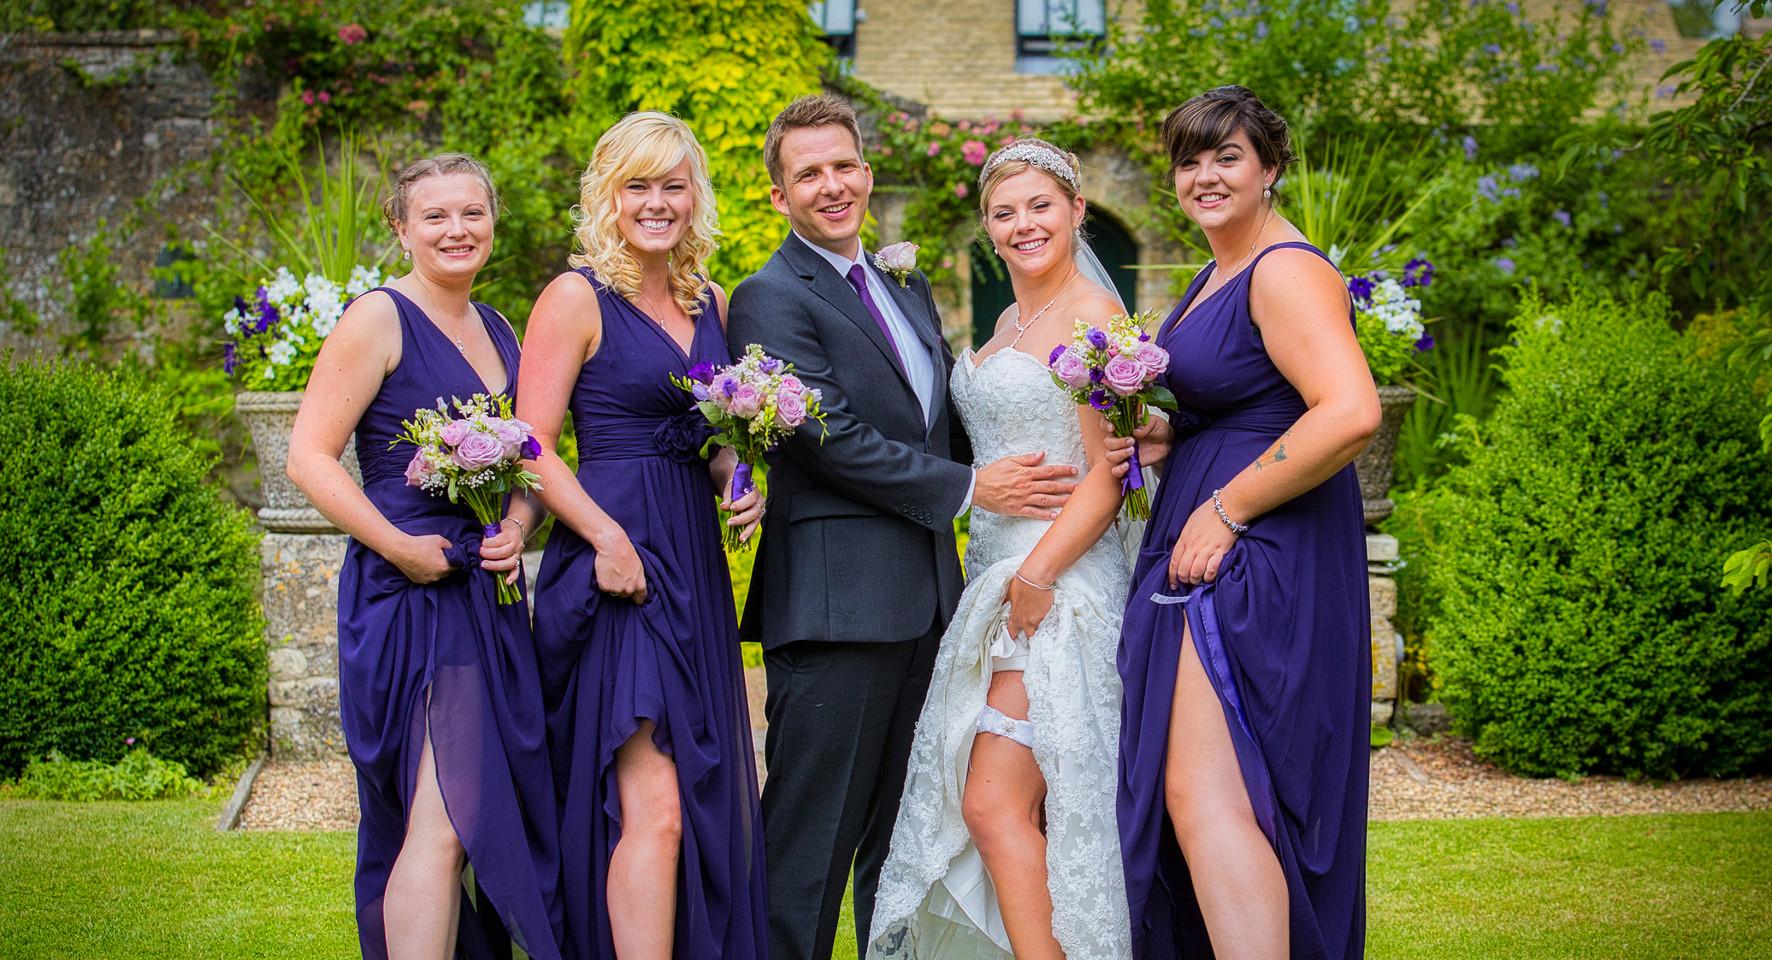 Bridal party posing legs